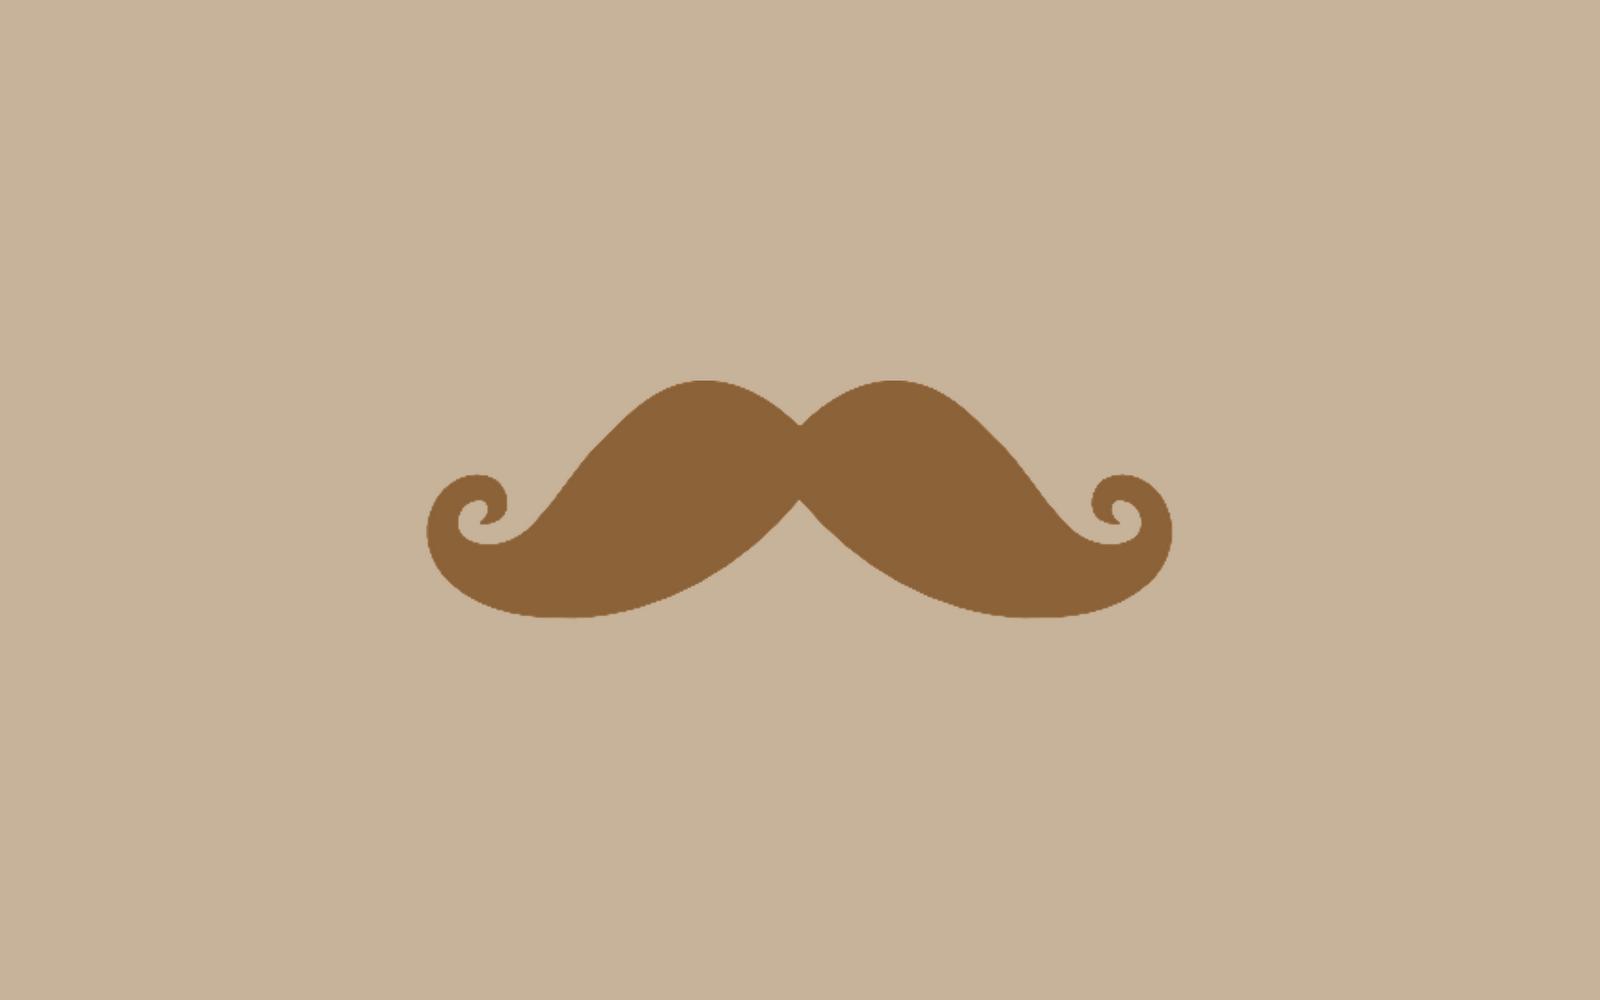 wallpapers�� wallpaper mustache